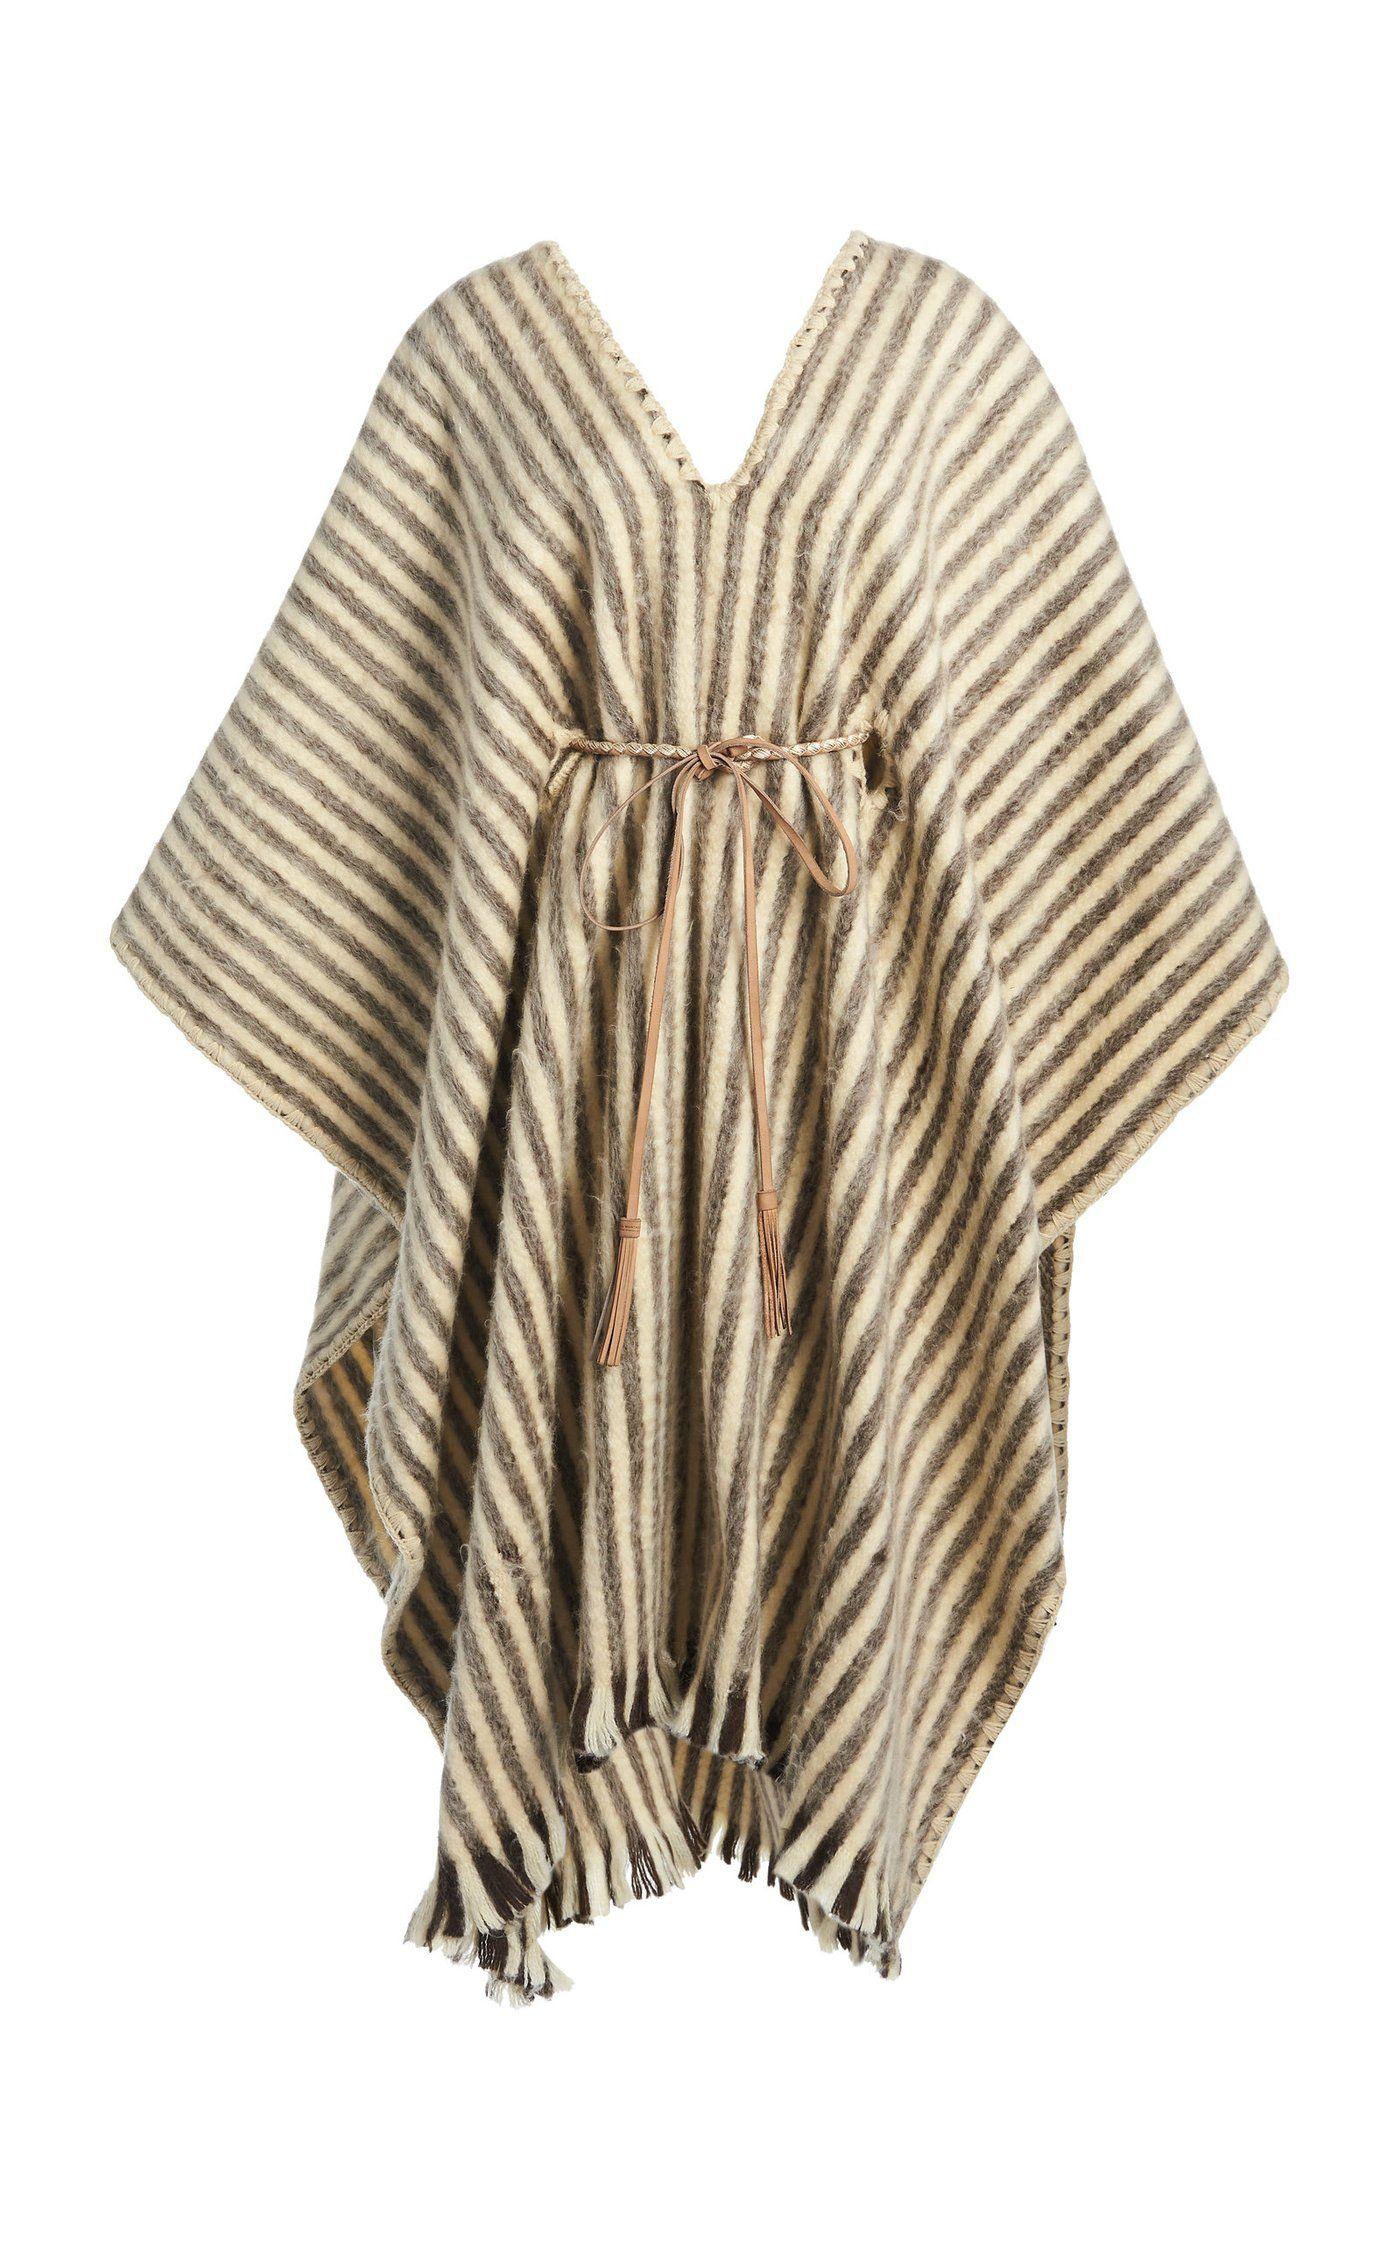 Abrazame A Besos Striped Wool Poncho By Johanna Ortiz Moda Operandi In 2021 Wool Poncho Embroidered Wool Fashion